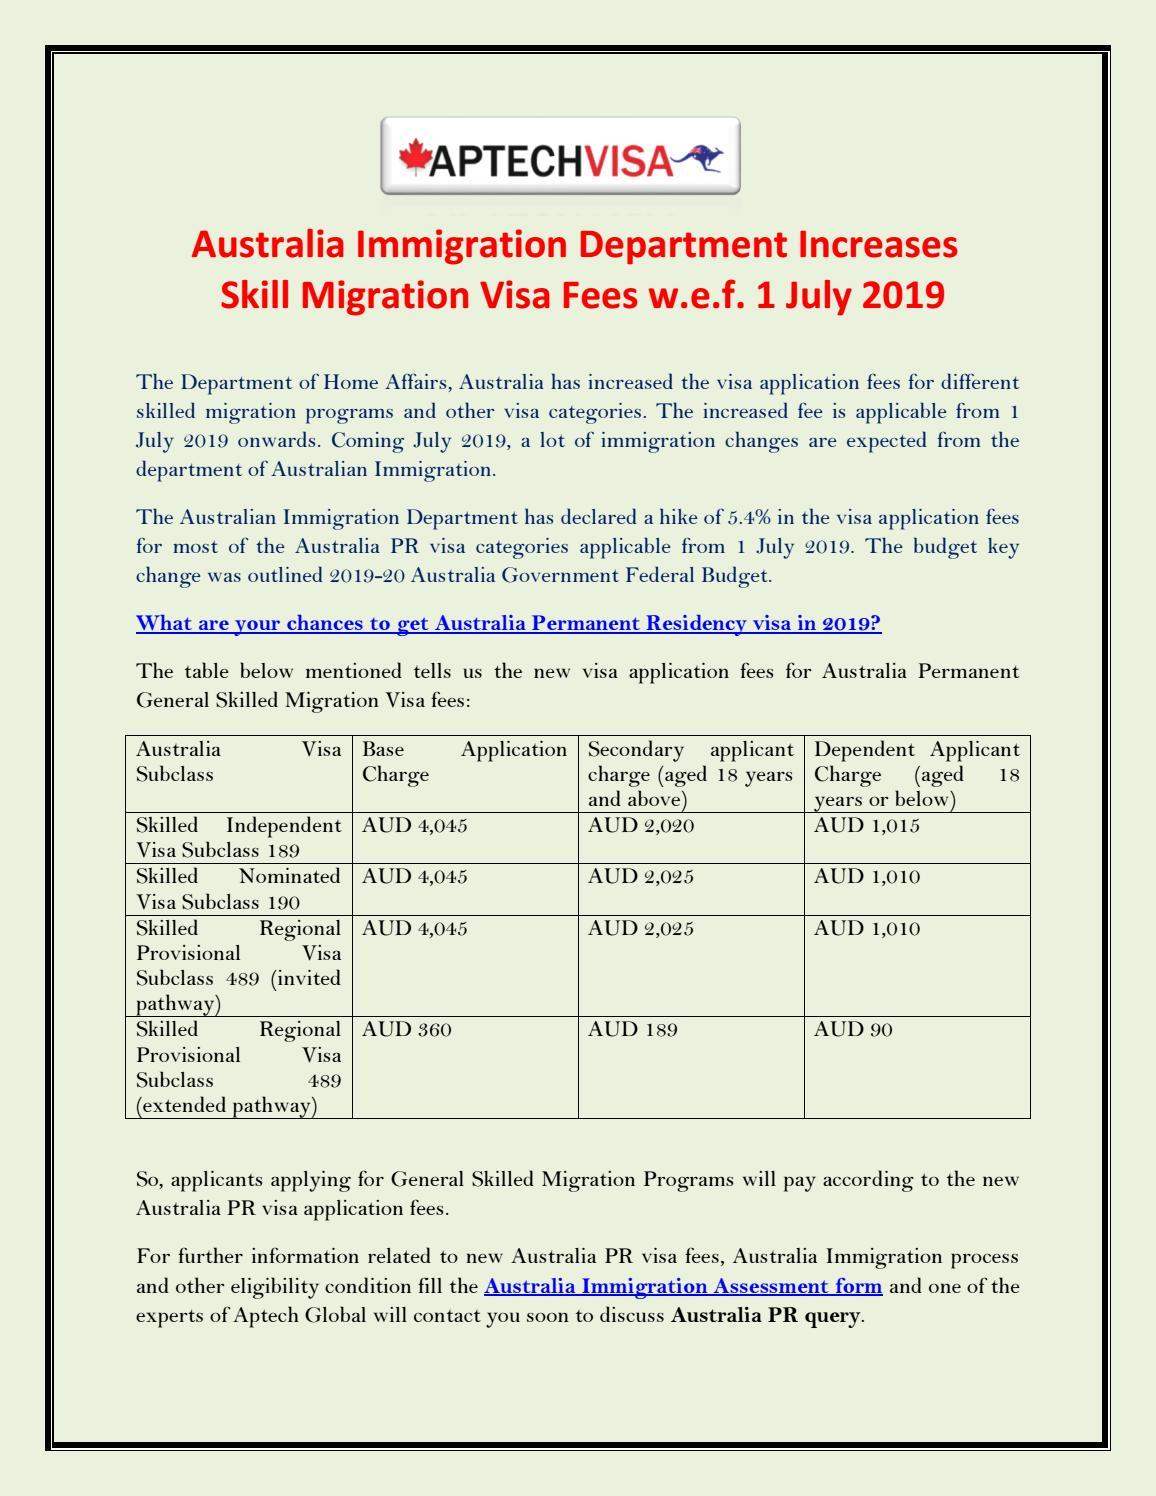 Australia Immigration Department Increases Skill Migration